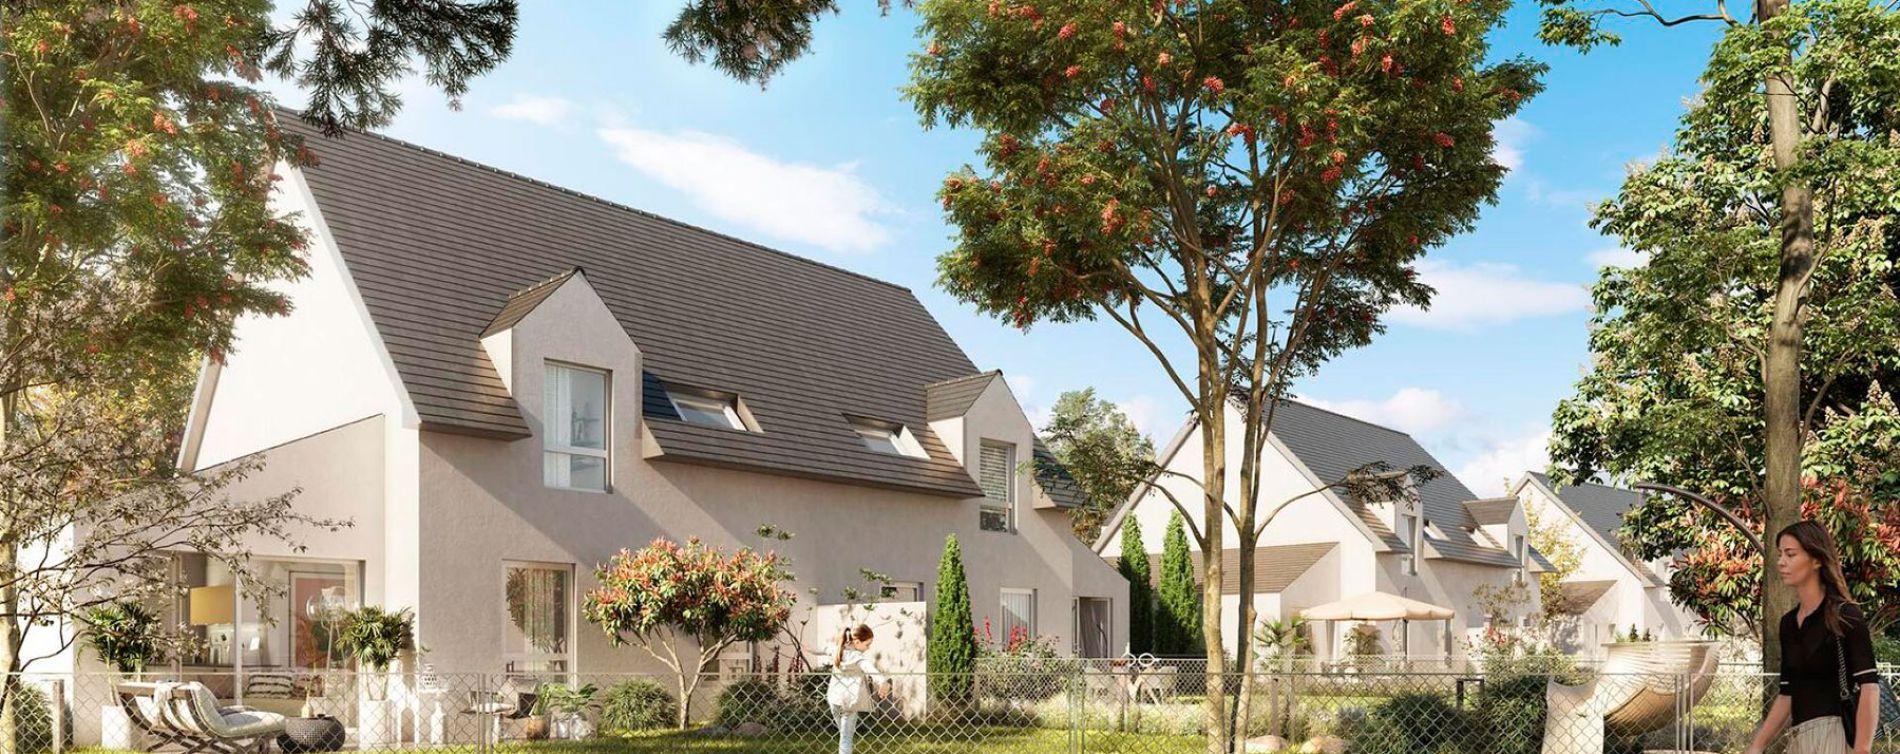 Résidence Avelys à Baden